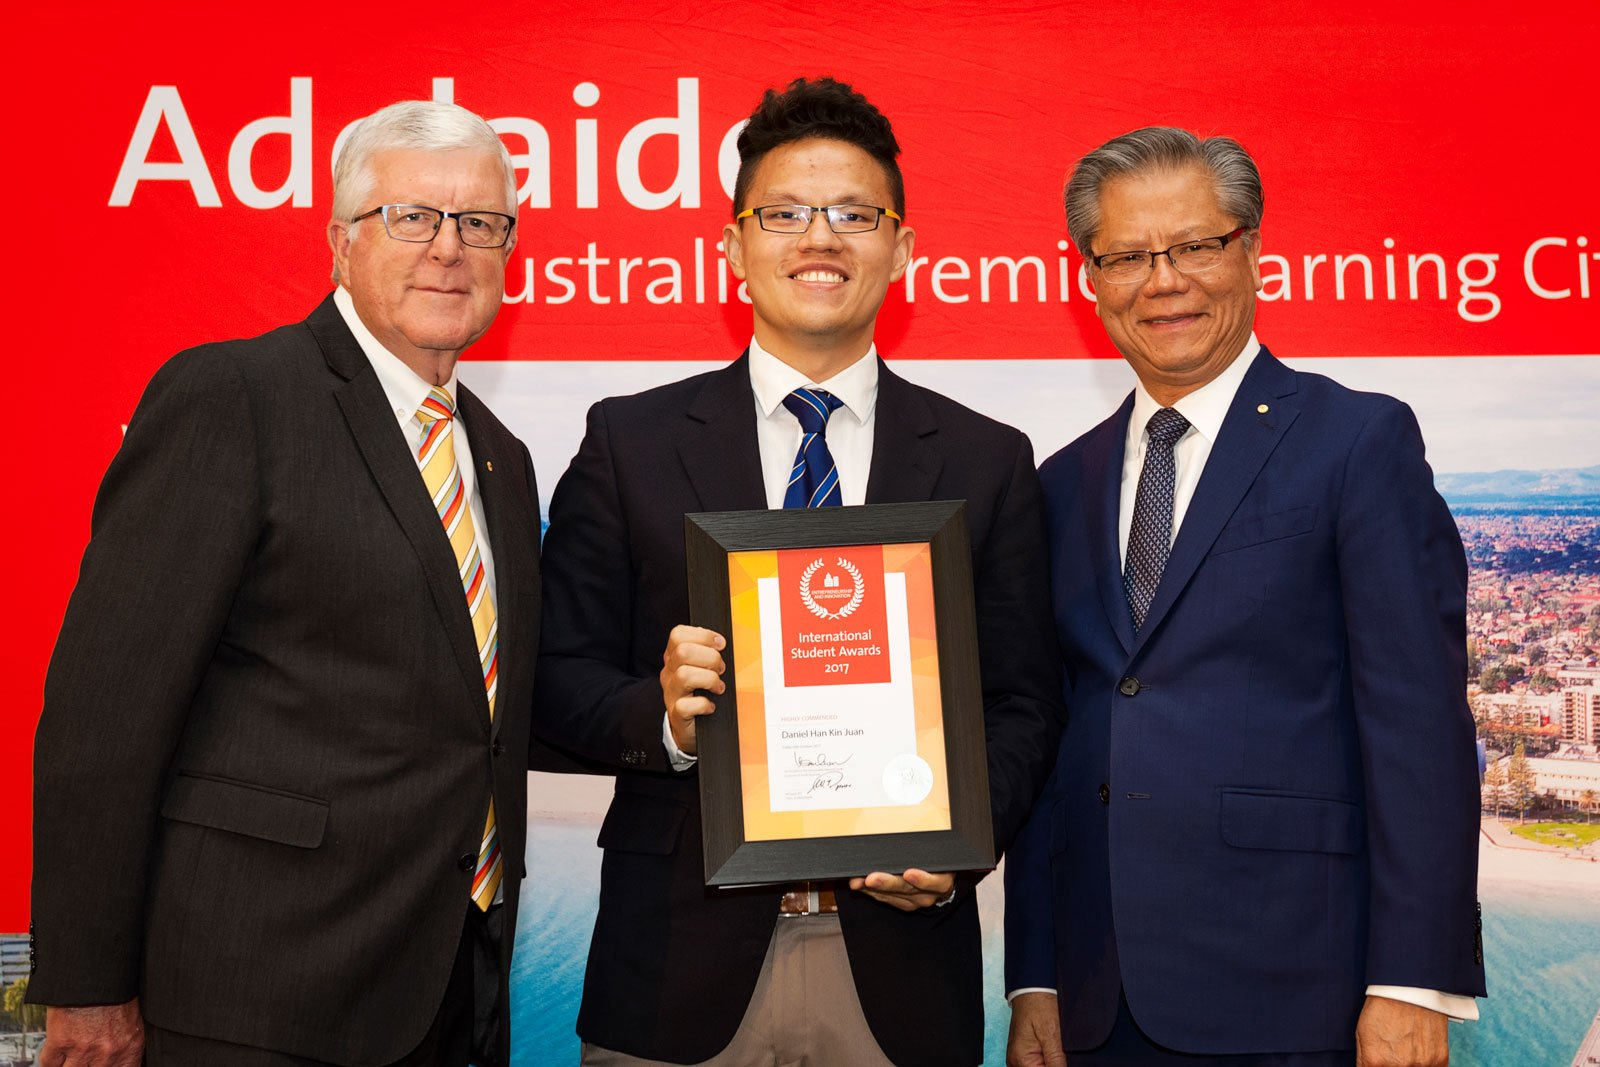 Innovative student Daniel Han Kin Juan wins 2nd place